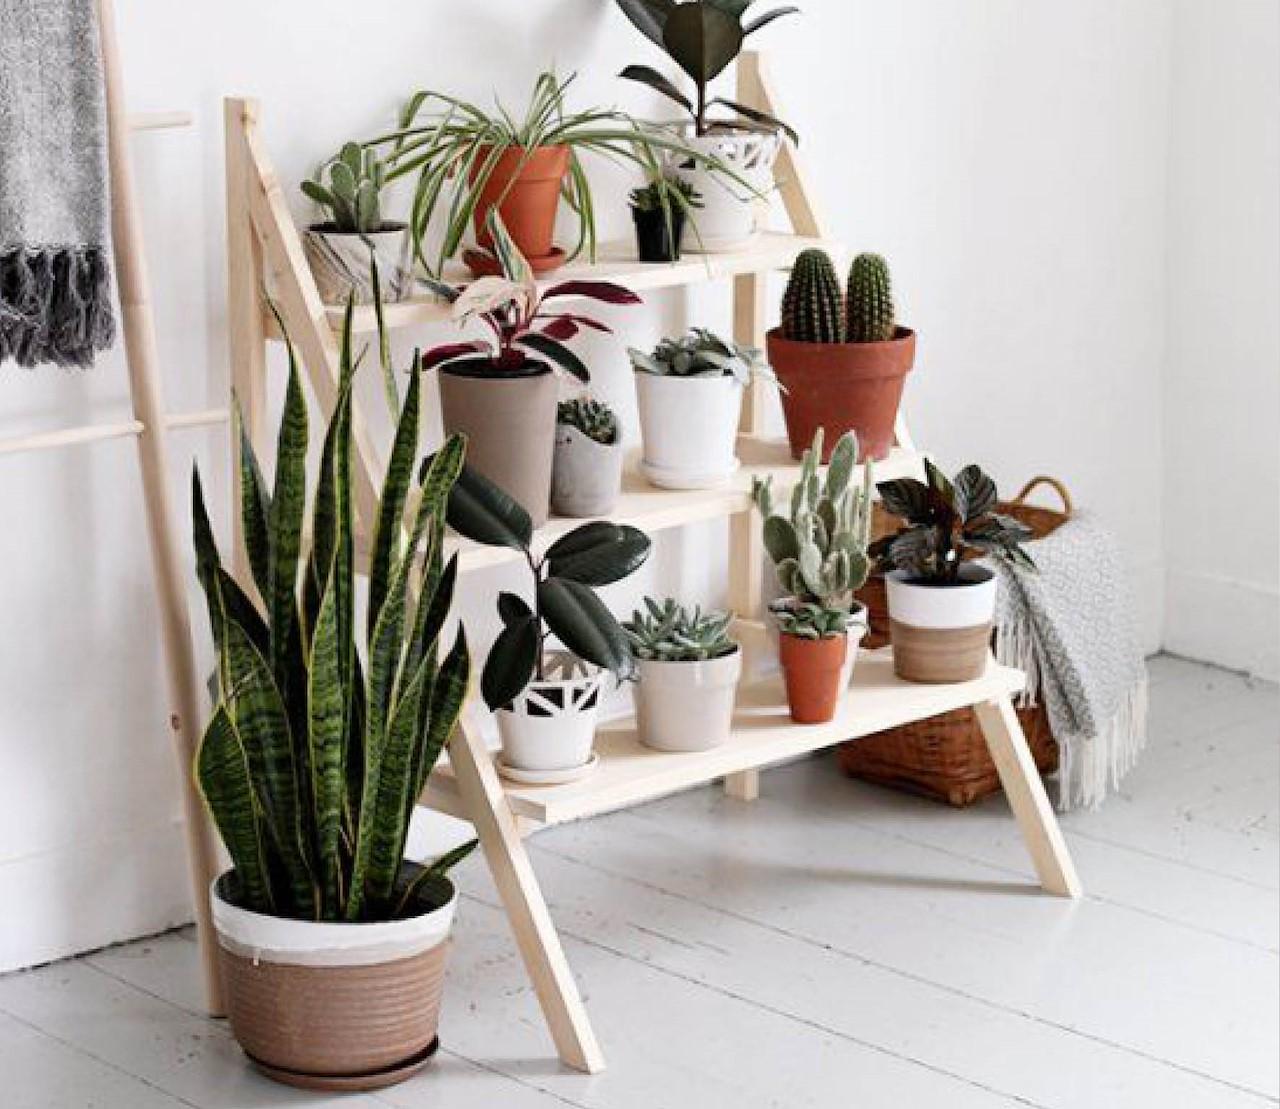 originele manieren om je kamerplanten te presenteren